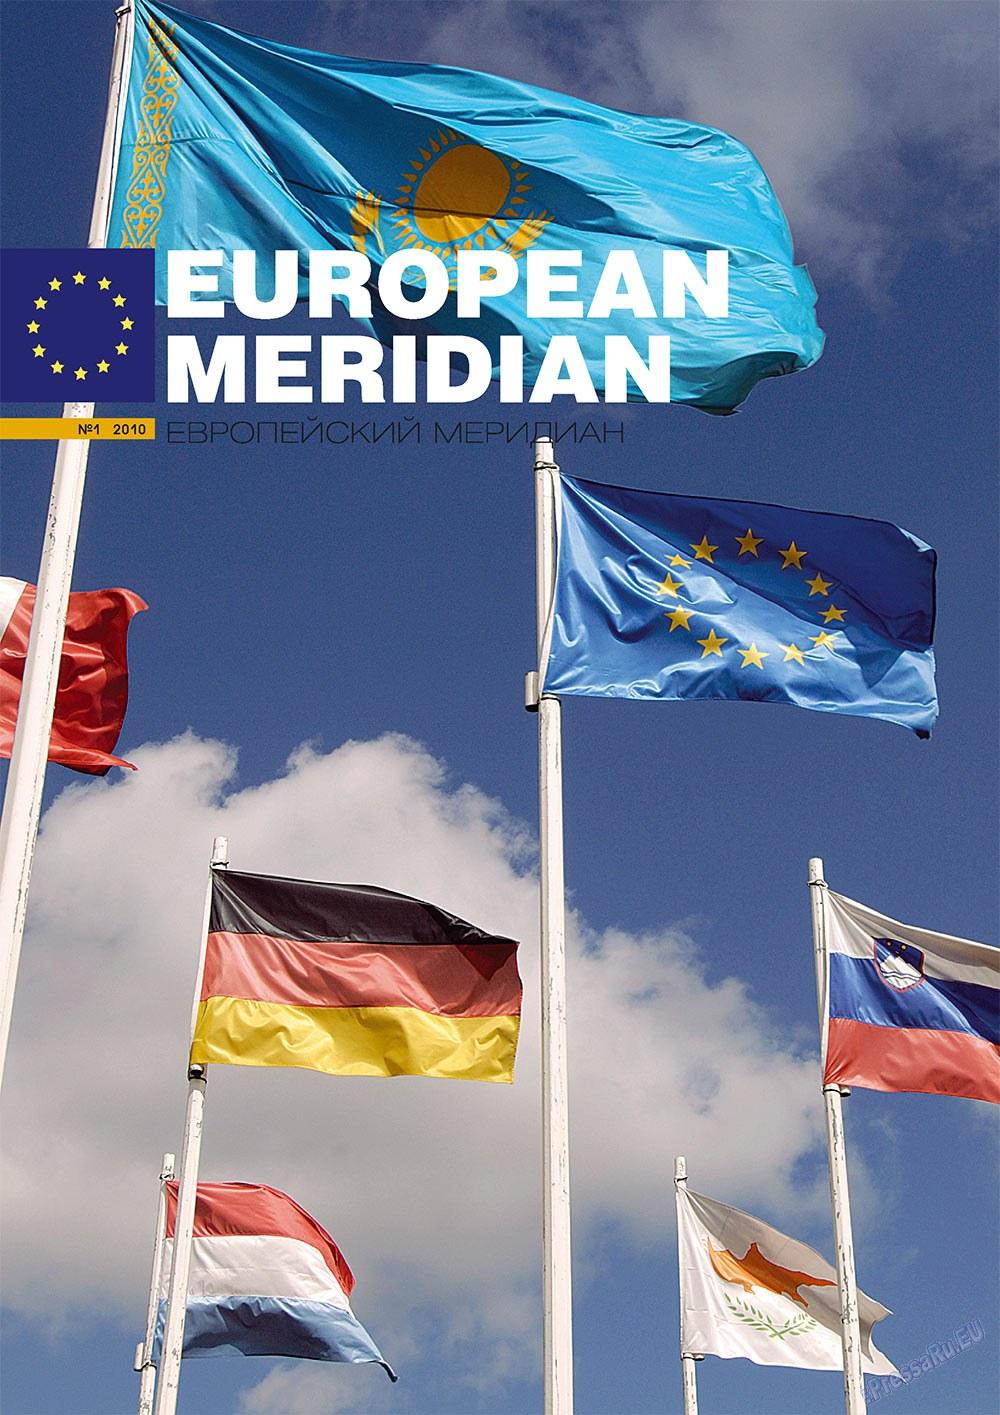 Европейский меридиан (журнал). 2010 год, номер 1, стр. 1